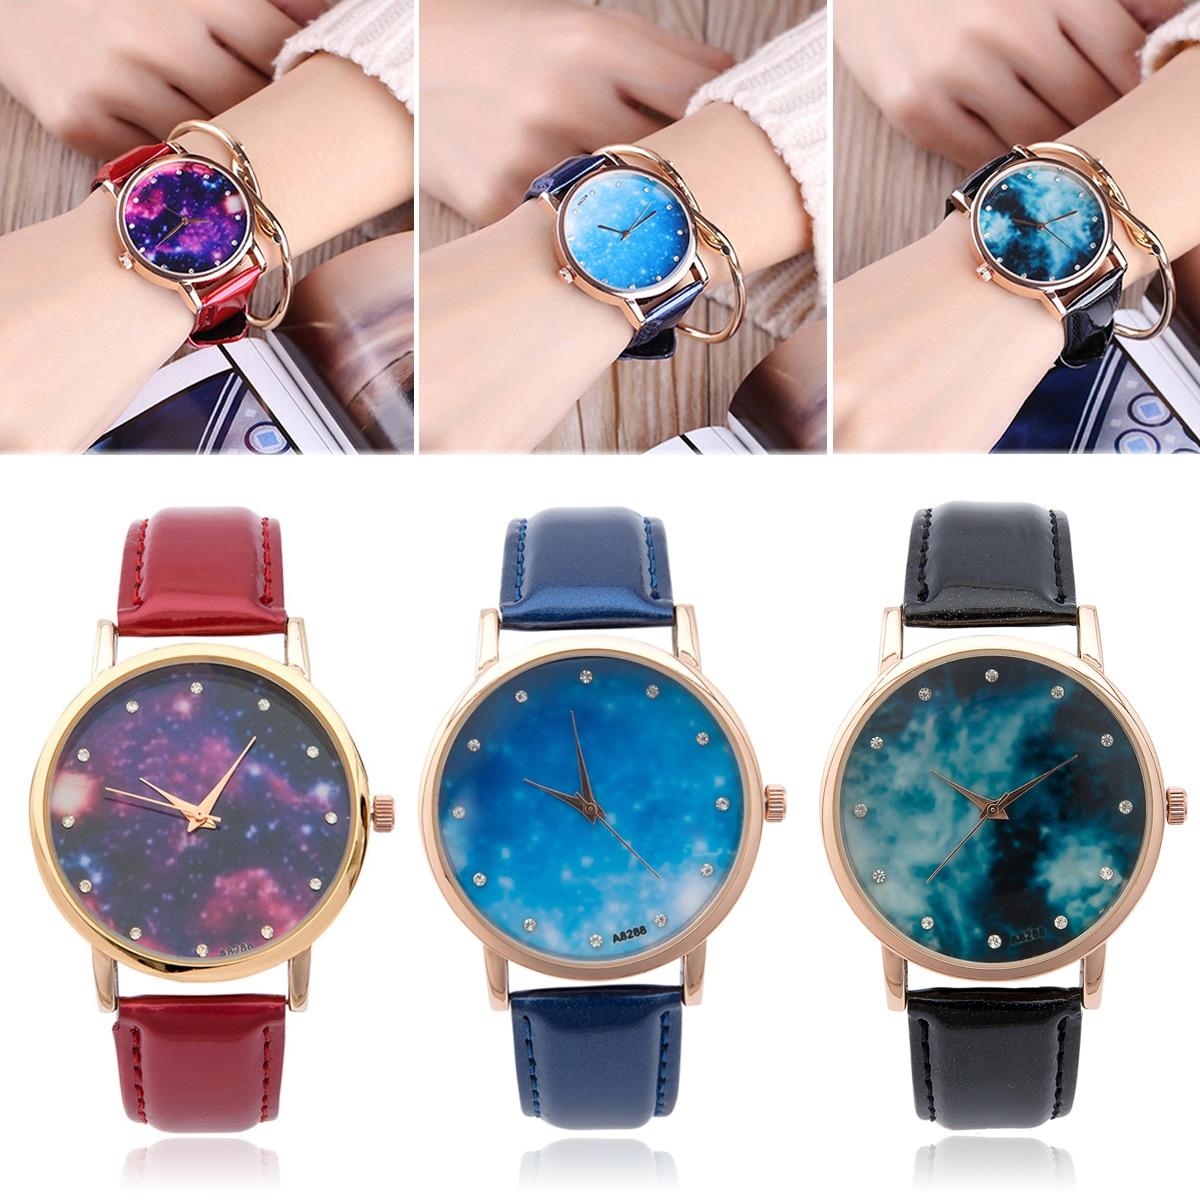 Shellhard Fashion Elegant Women\`s Casual Star Sky Leather Watch Space Pattern Rhinestone Leather Quartz Wrist Watch Ladies Gift